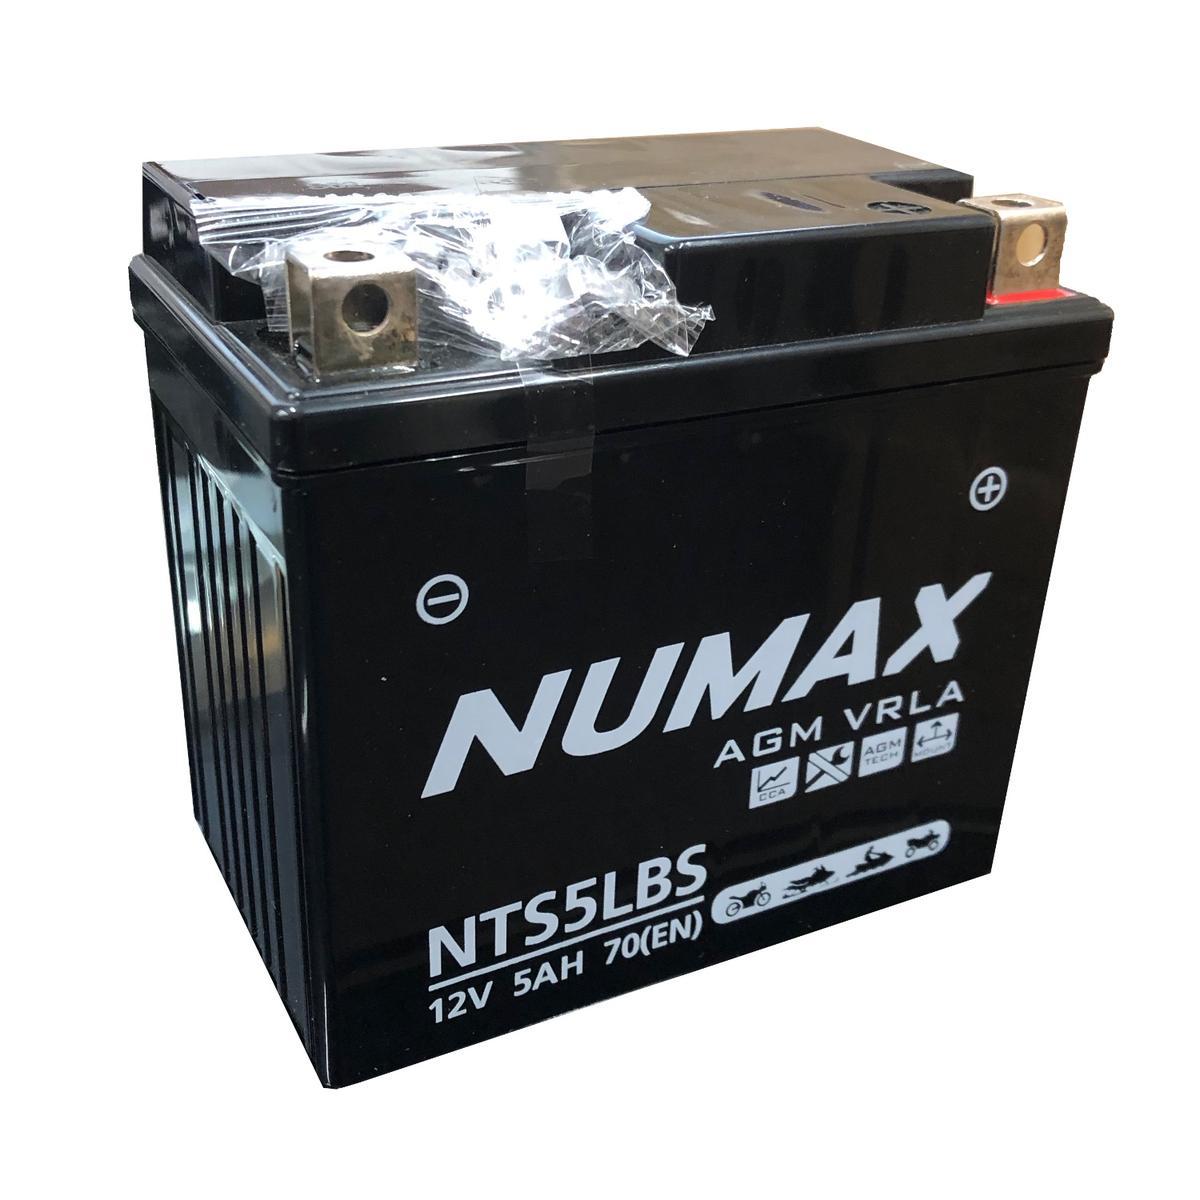 Numax 12v NTS5LBS Motorbike Bike Battery HONDA 100cc NF100M YTX5L-BS